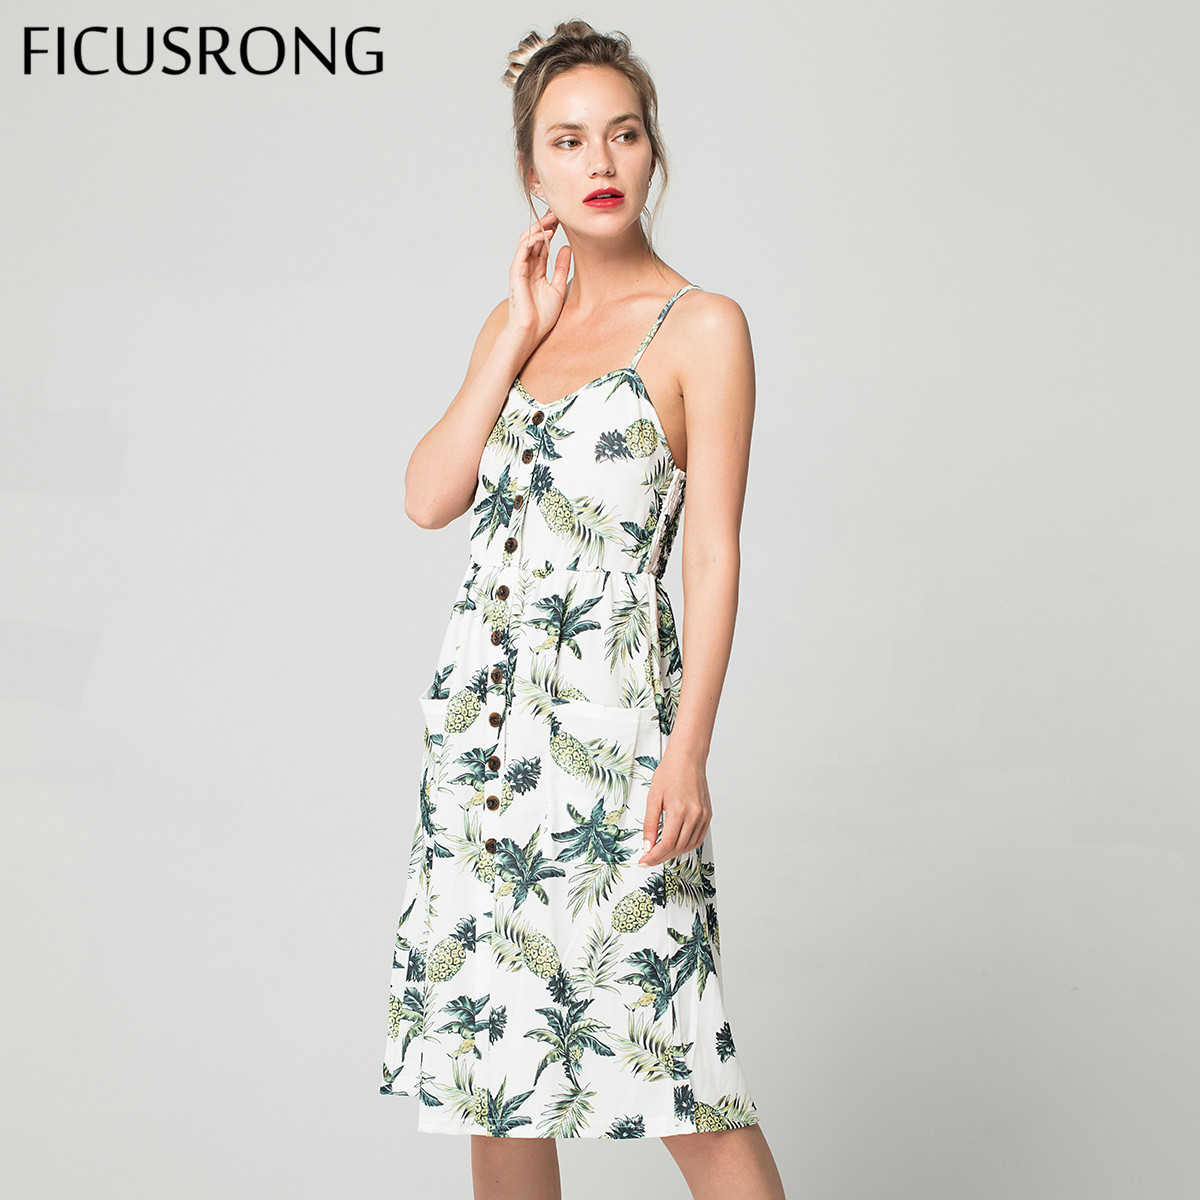 2019 sommer Frauen Knopf Verziert Print Kleid Off-schulter Party Strand Sommerkleid Boho Spaghetti Lange Kleider Plus Größe FICUSRONG